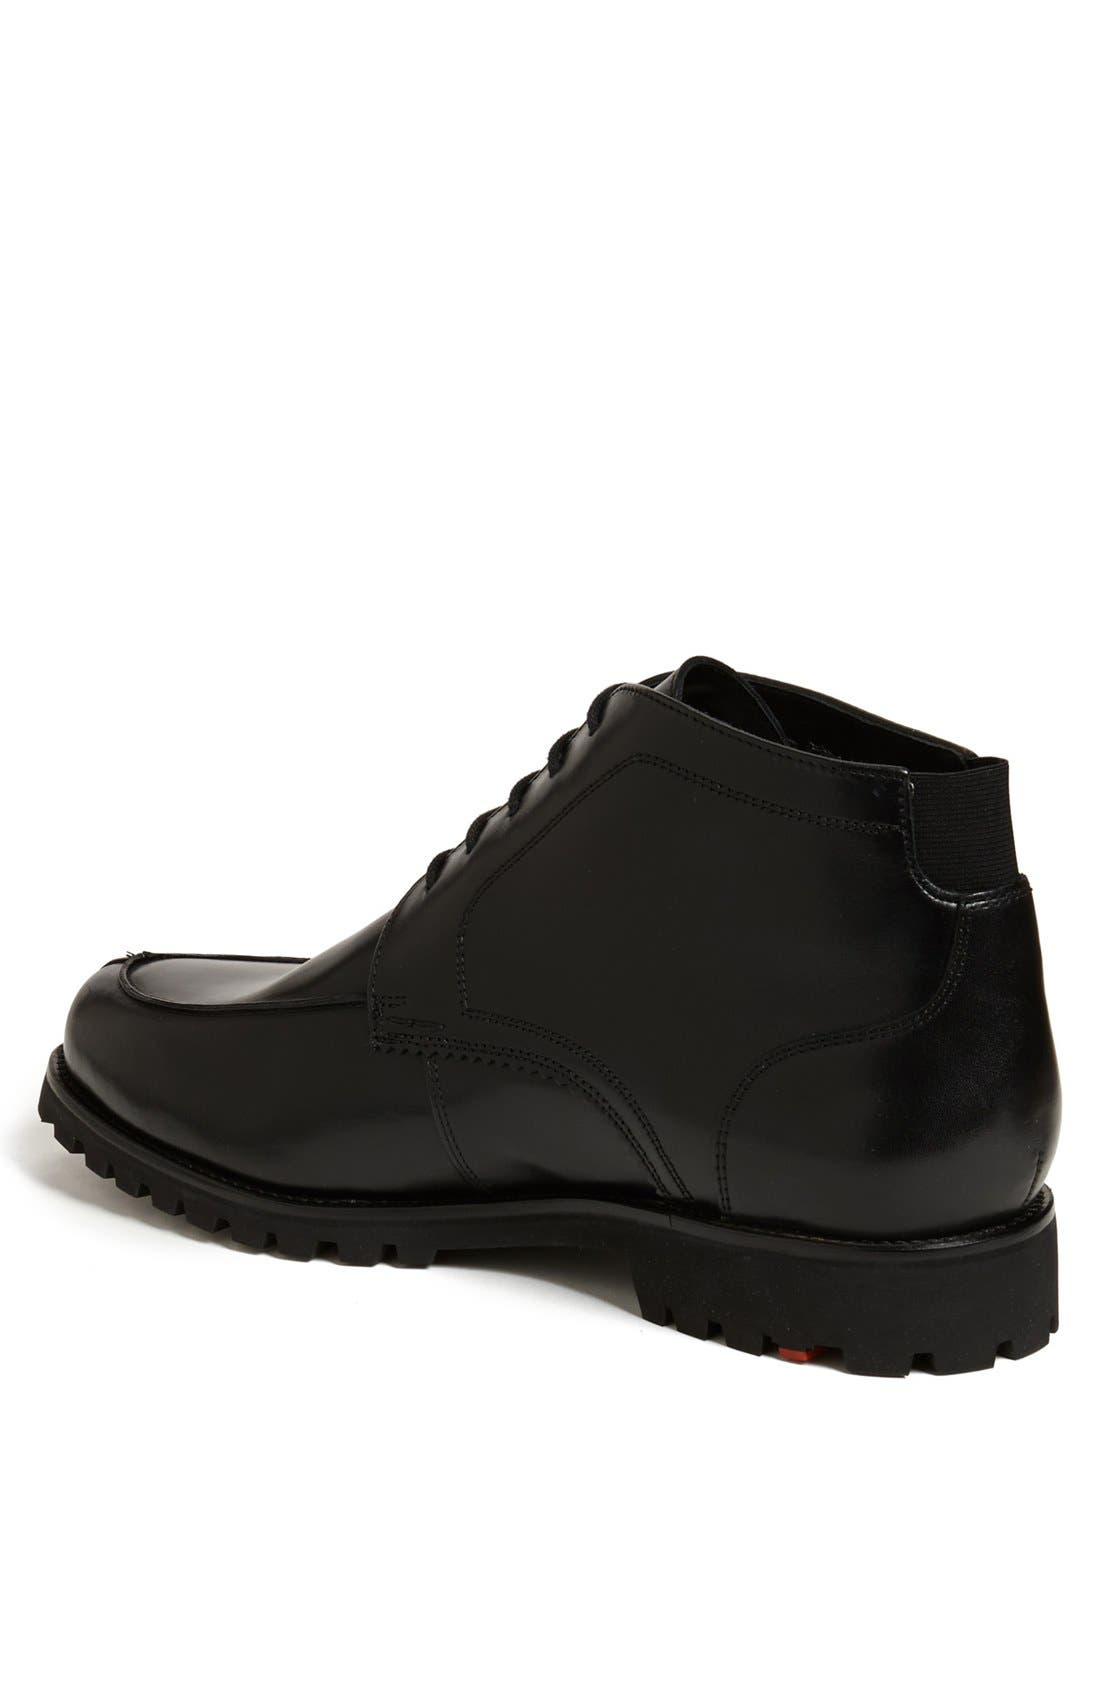 'Varello' Chukka Boot,                             Alternate thumbnail 2, color,                             Black